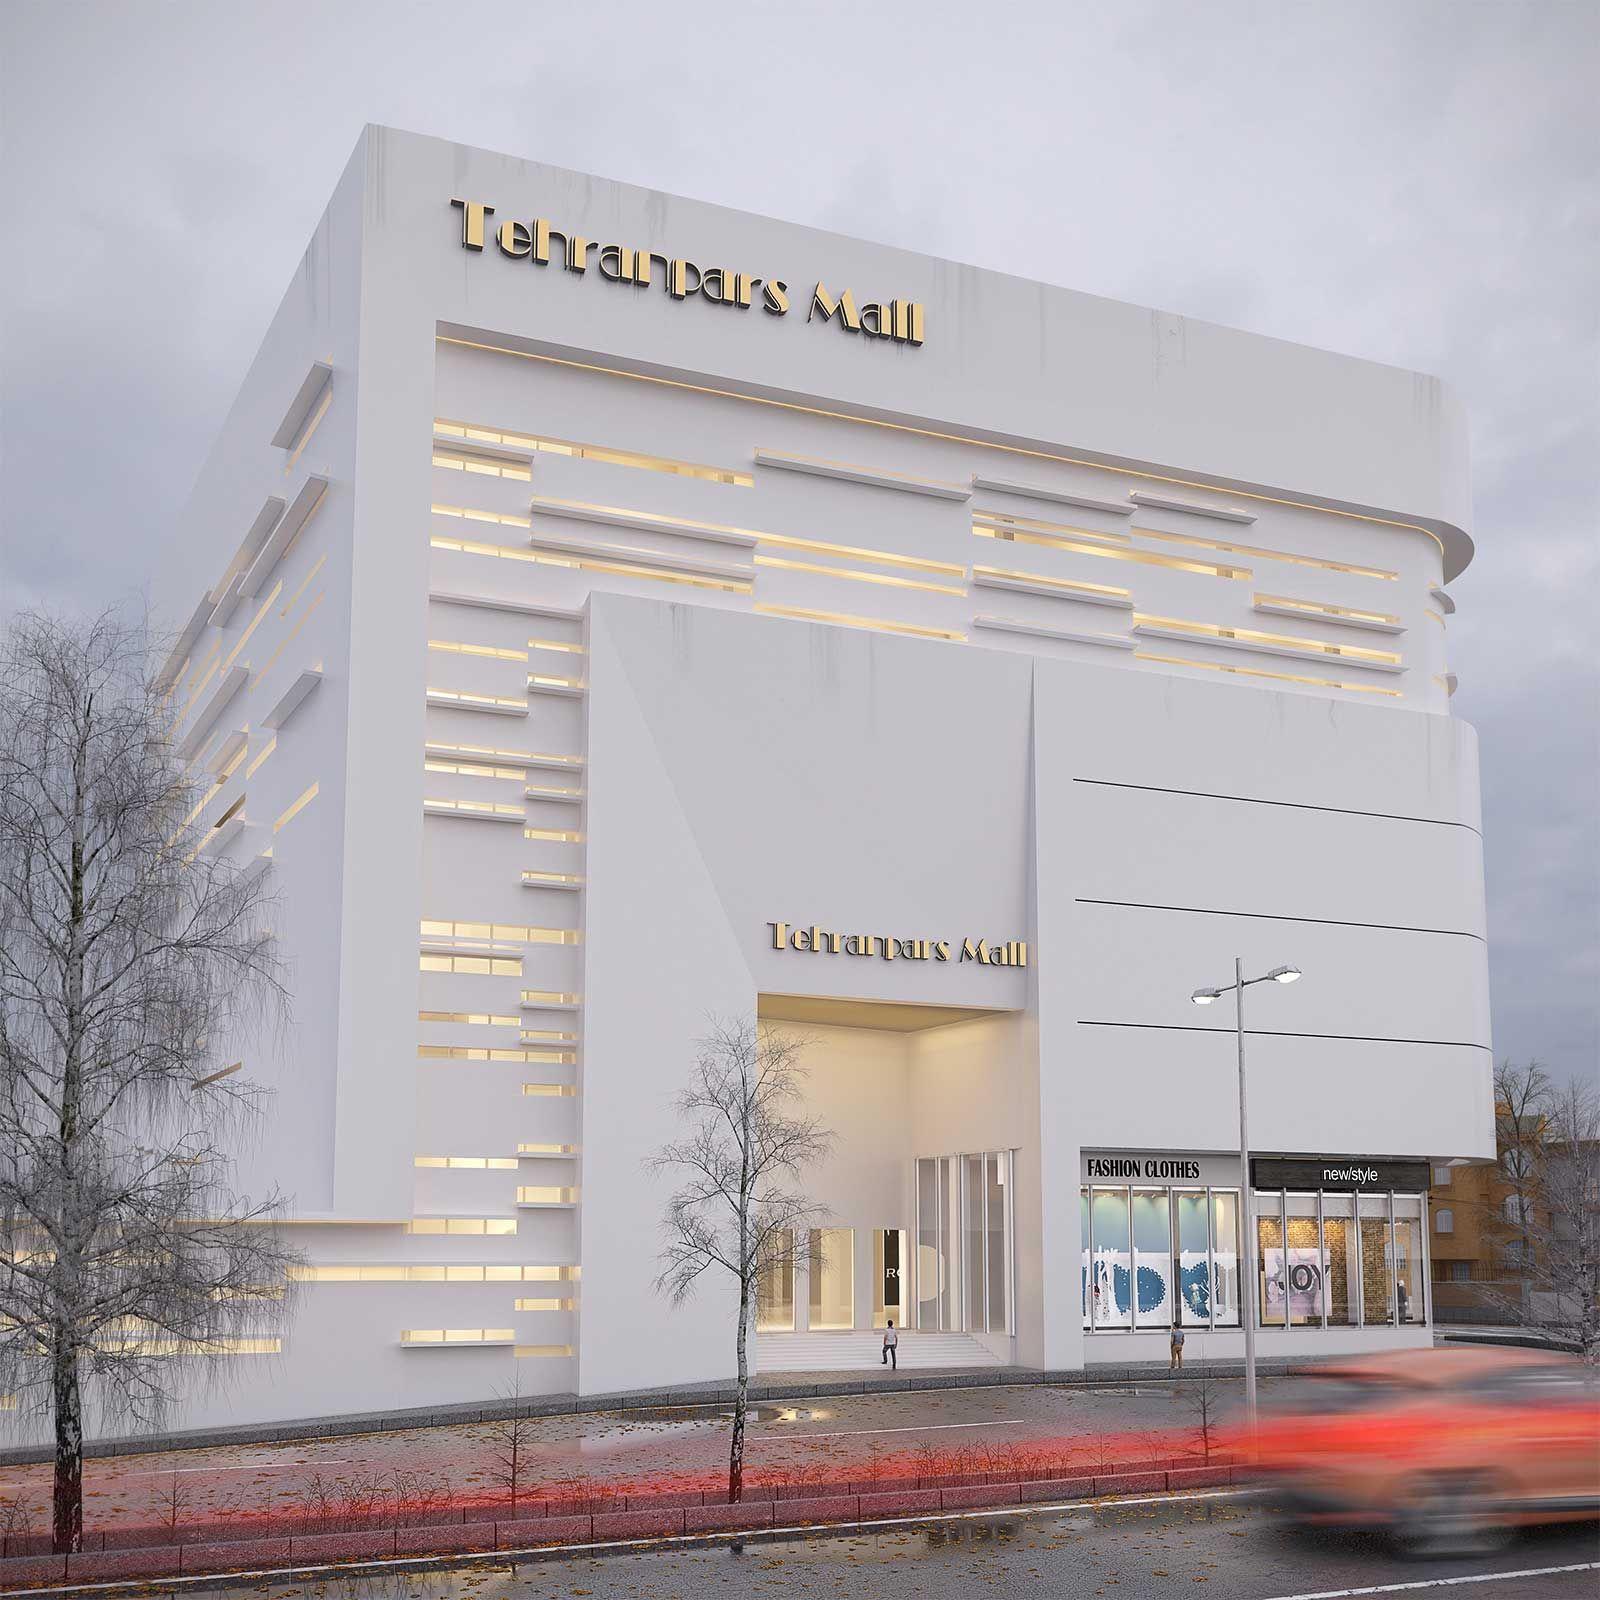 Vrayworld - Tehranpars Mall Facade Shopping Malls Pinte